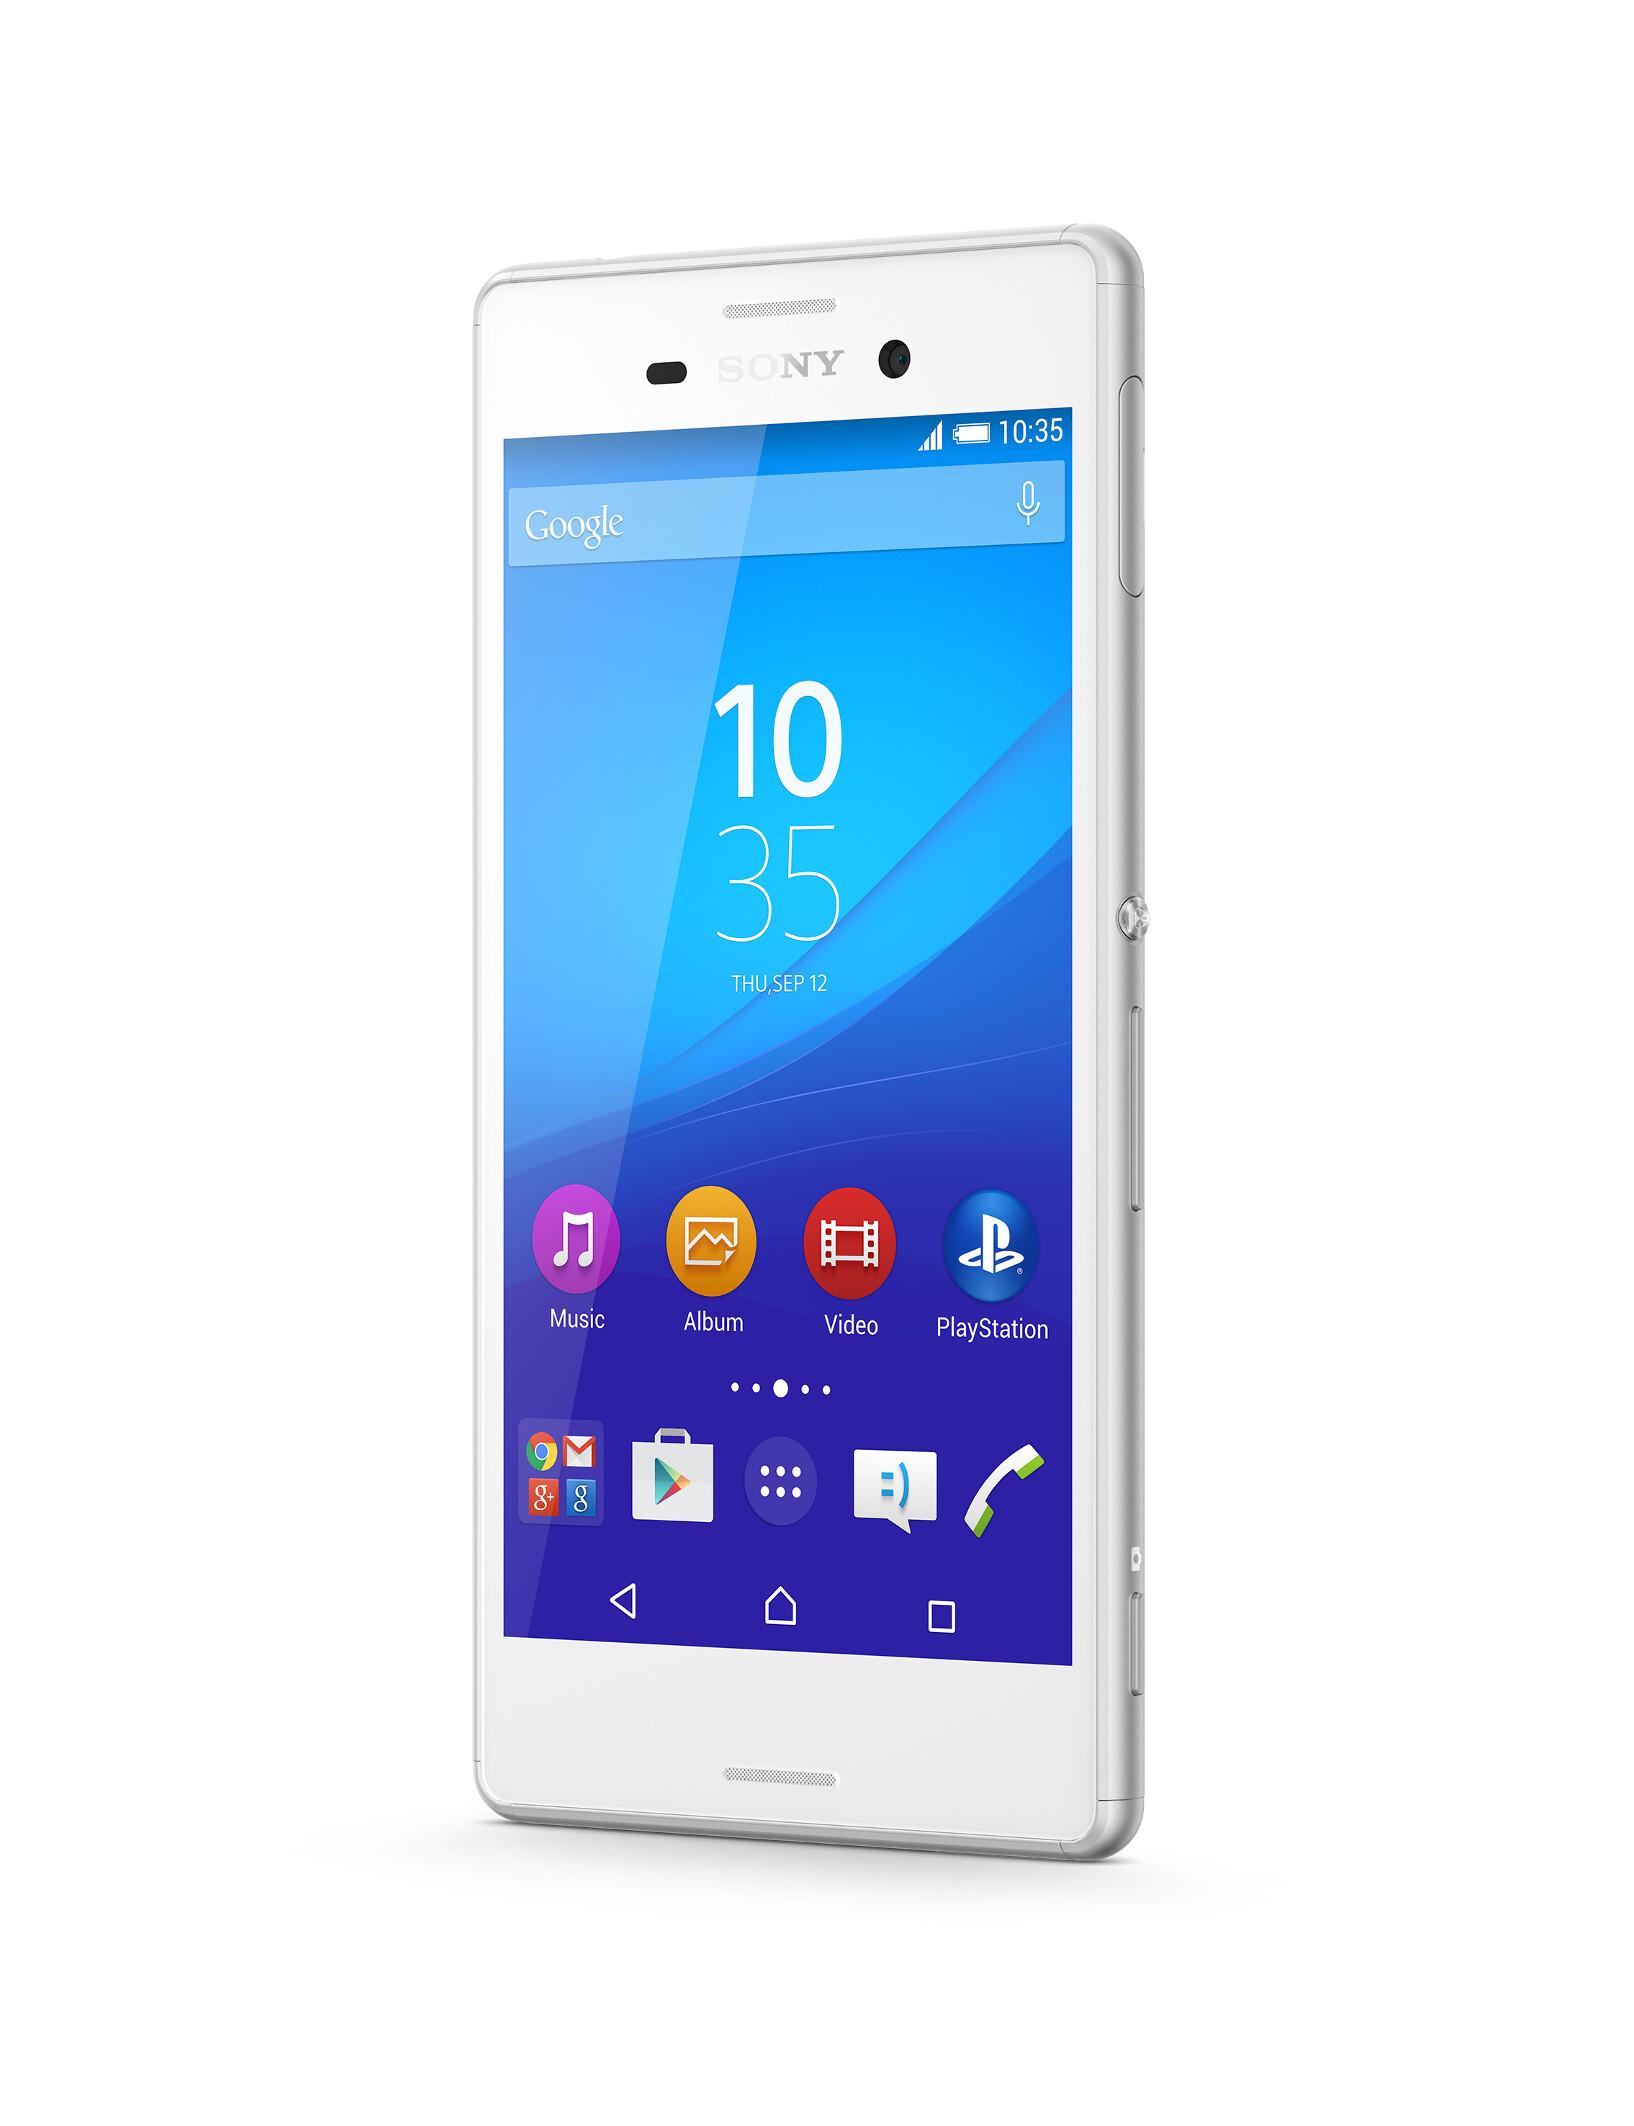 Xperia M Specification Sony Xperia M4 Aqua sp...